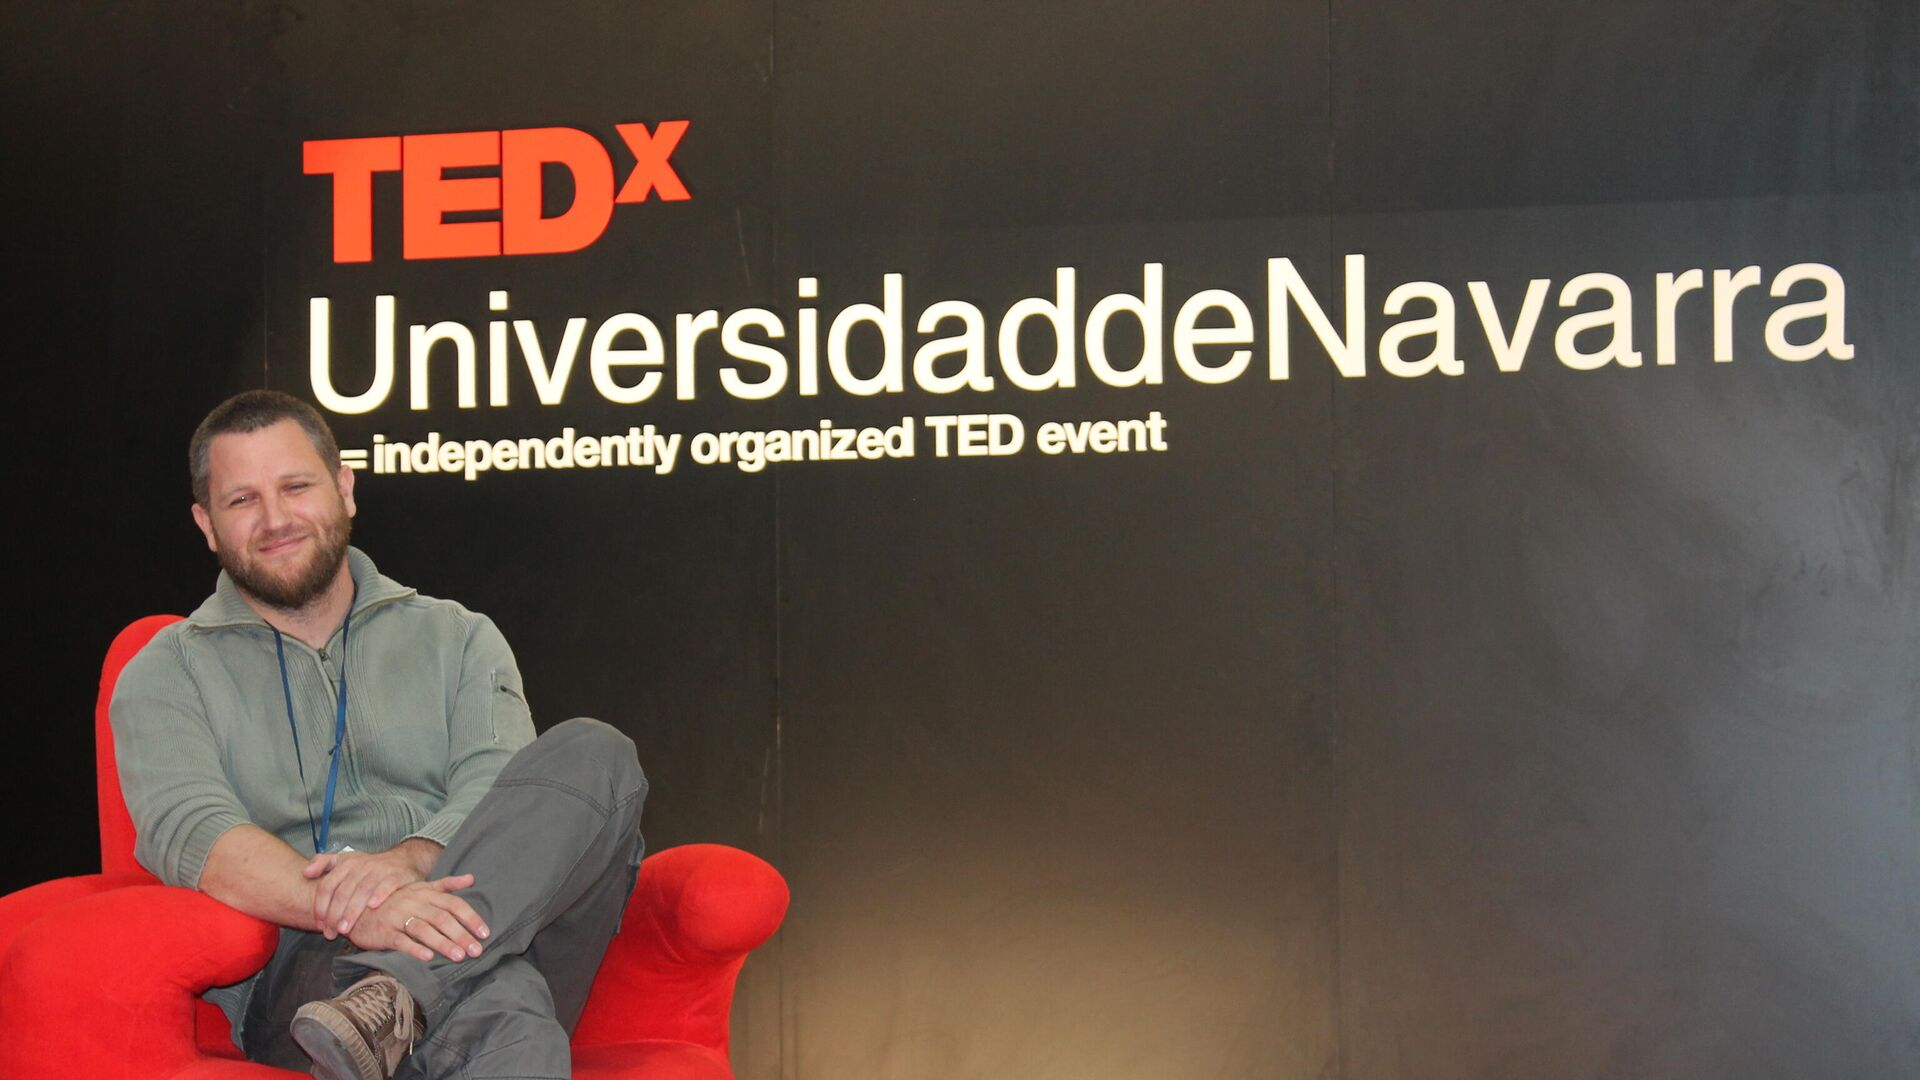 El reportero David Beriain, durante una charla  en Navarra de 2013 - Sputnik Mundo, 1920, 27.04.2021